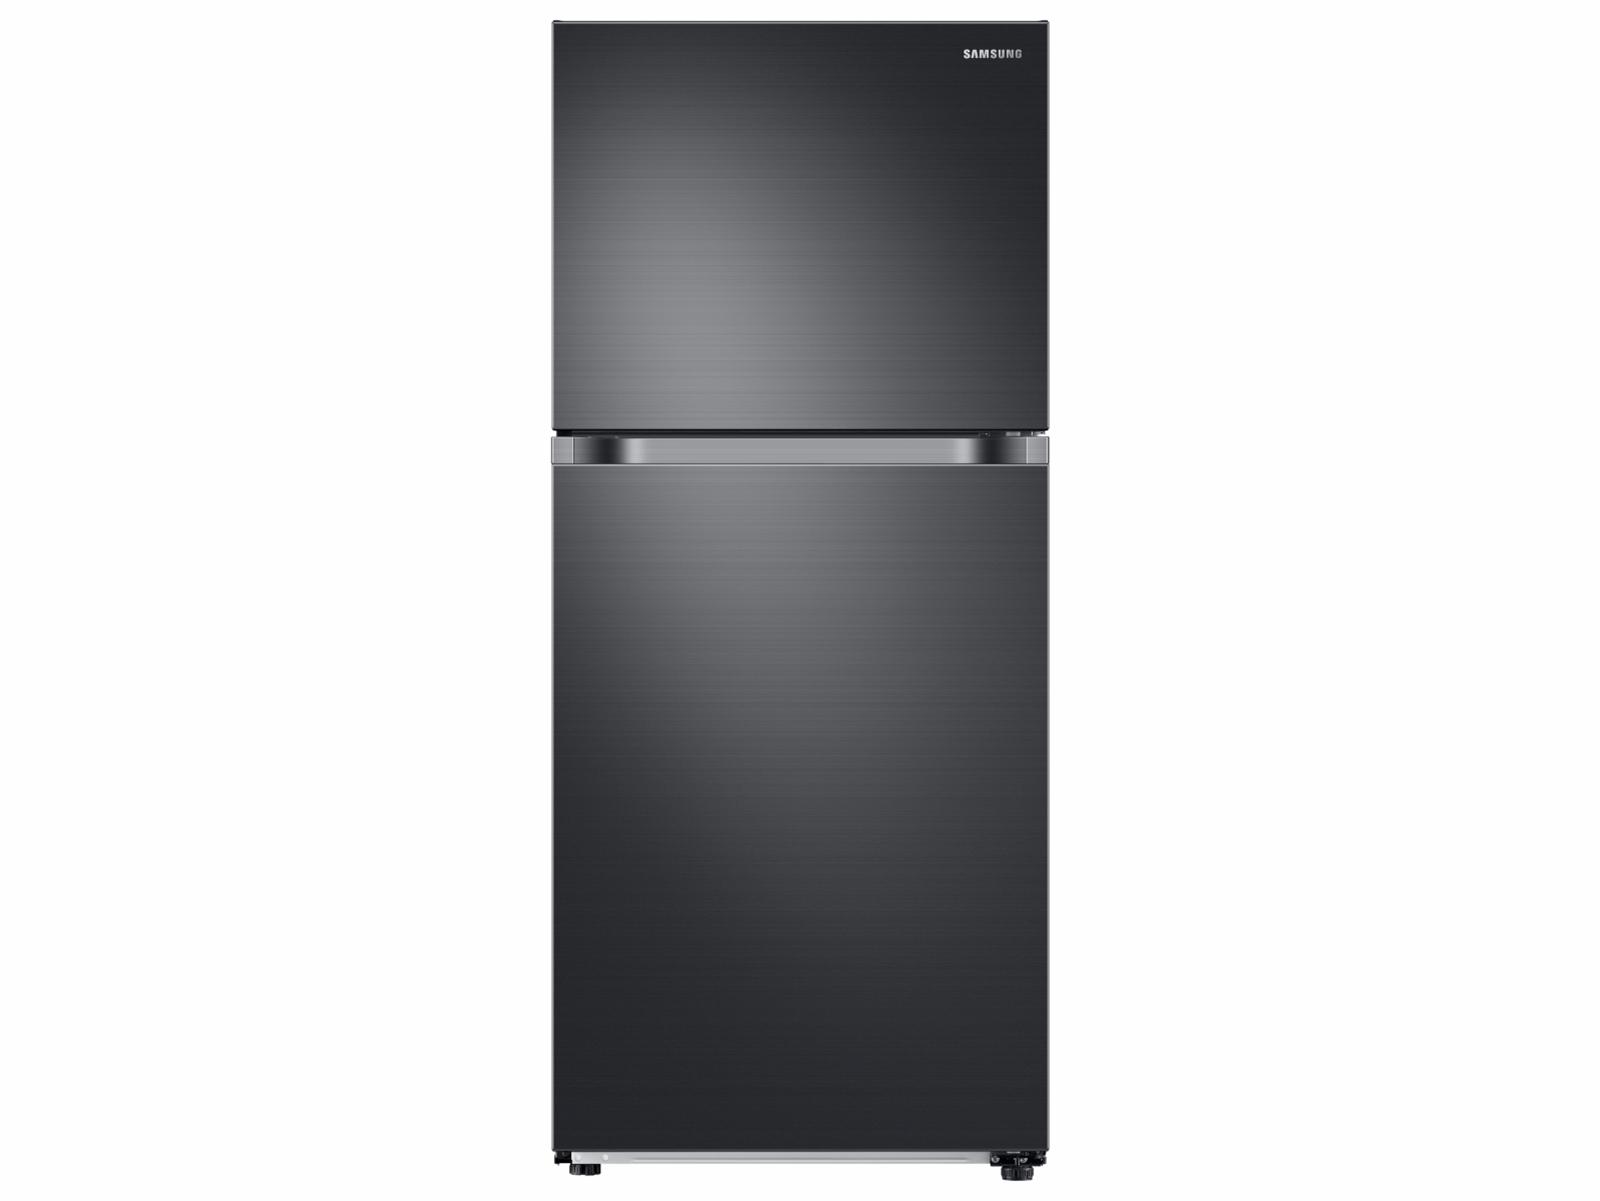 Samsung 18 cu. ft. Top Freezer Refrigerator with FlexZone in Black Stainless Steel, Fingerprint Resistant Black Stainless Steel